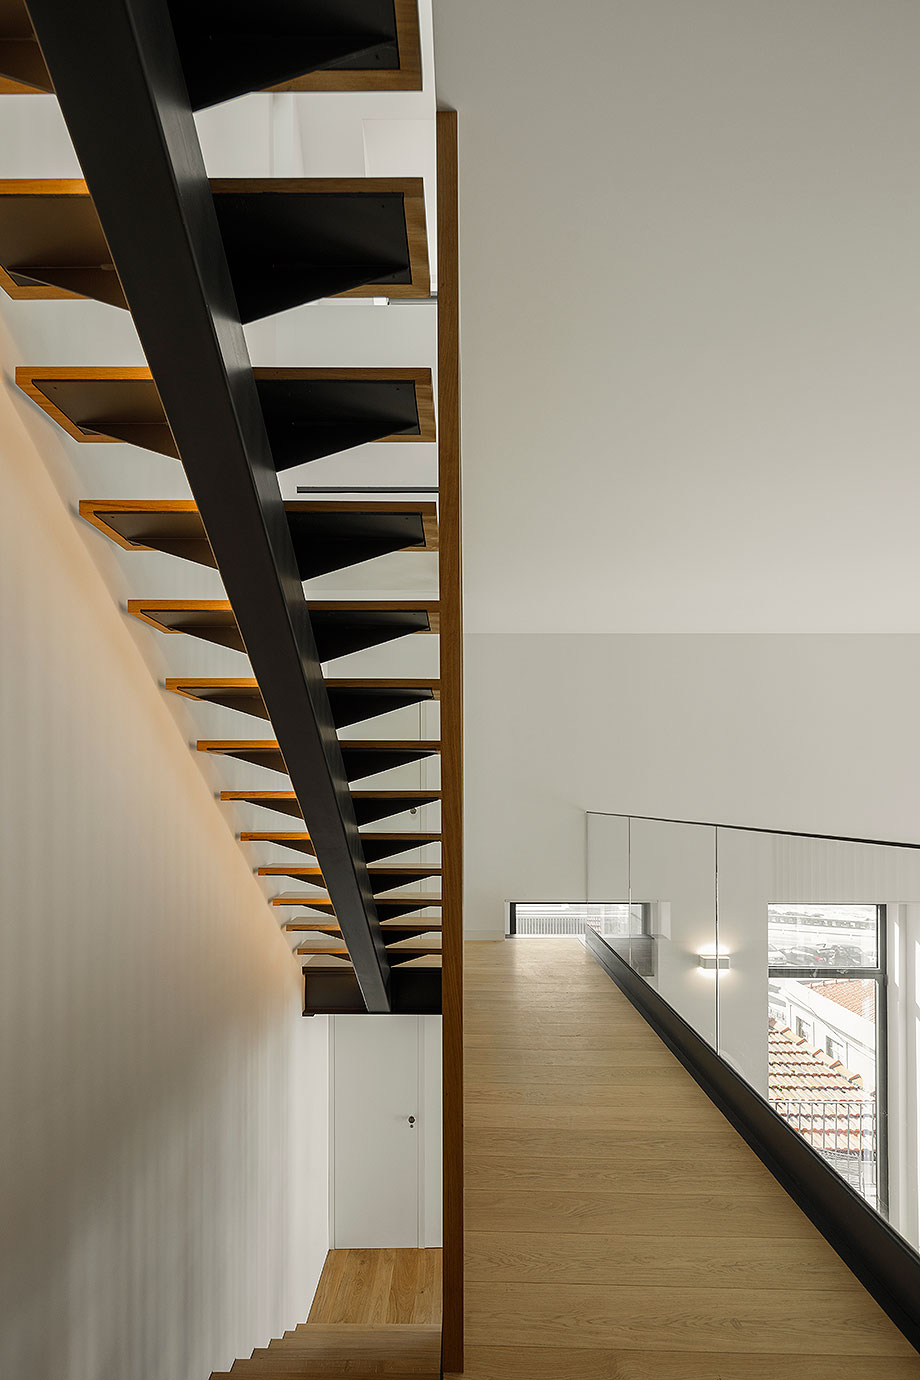 edificio sra da luz en oporto por as arquitecto (14) - foto ivo tavares